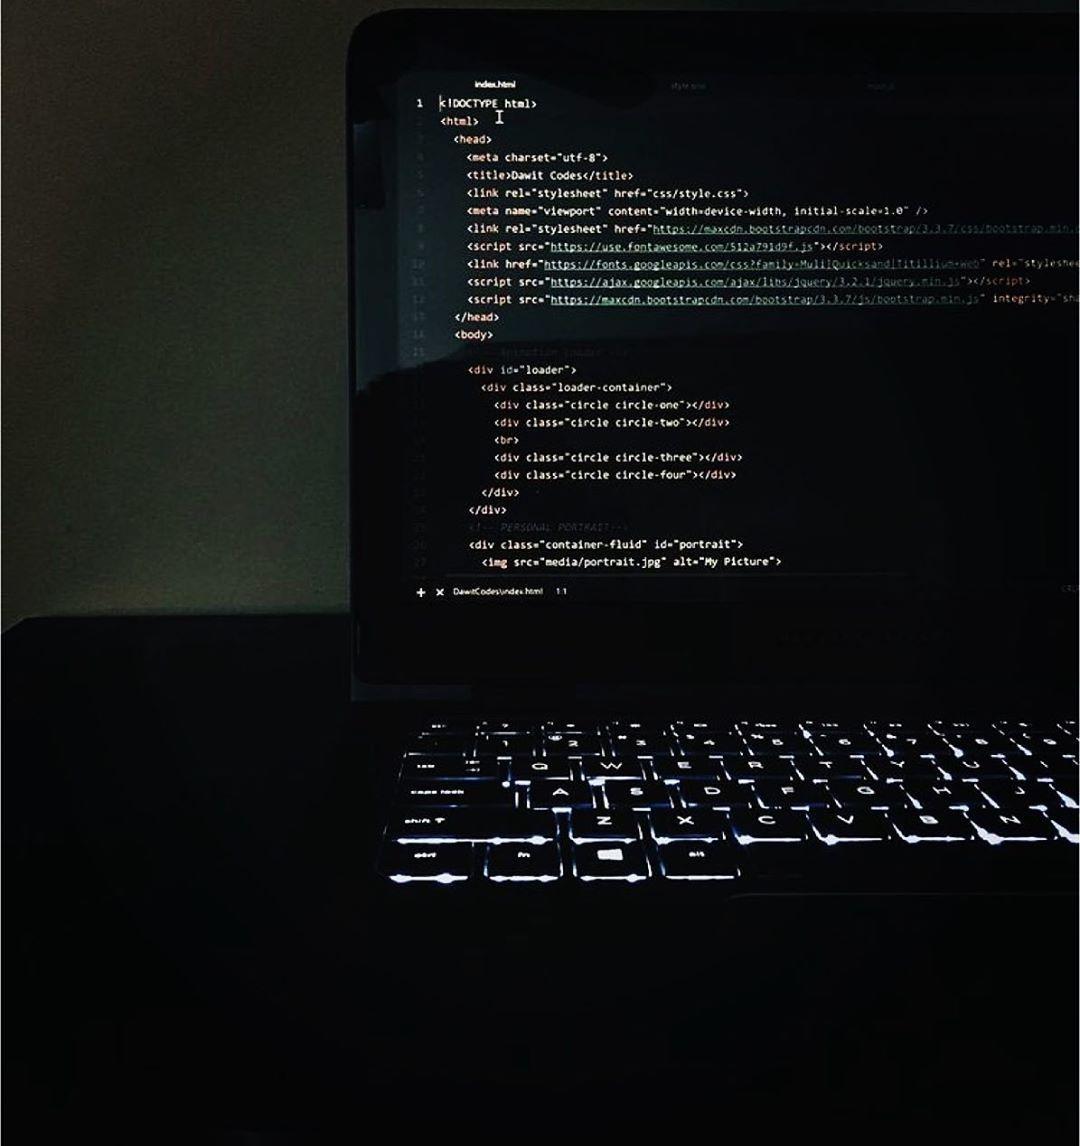 Genercodice Com Generacodice Sqlserver Php Developer Development Code Coding Codinglife Programmer Progr Perspective On Life Dark Aesthetic Aesthetic